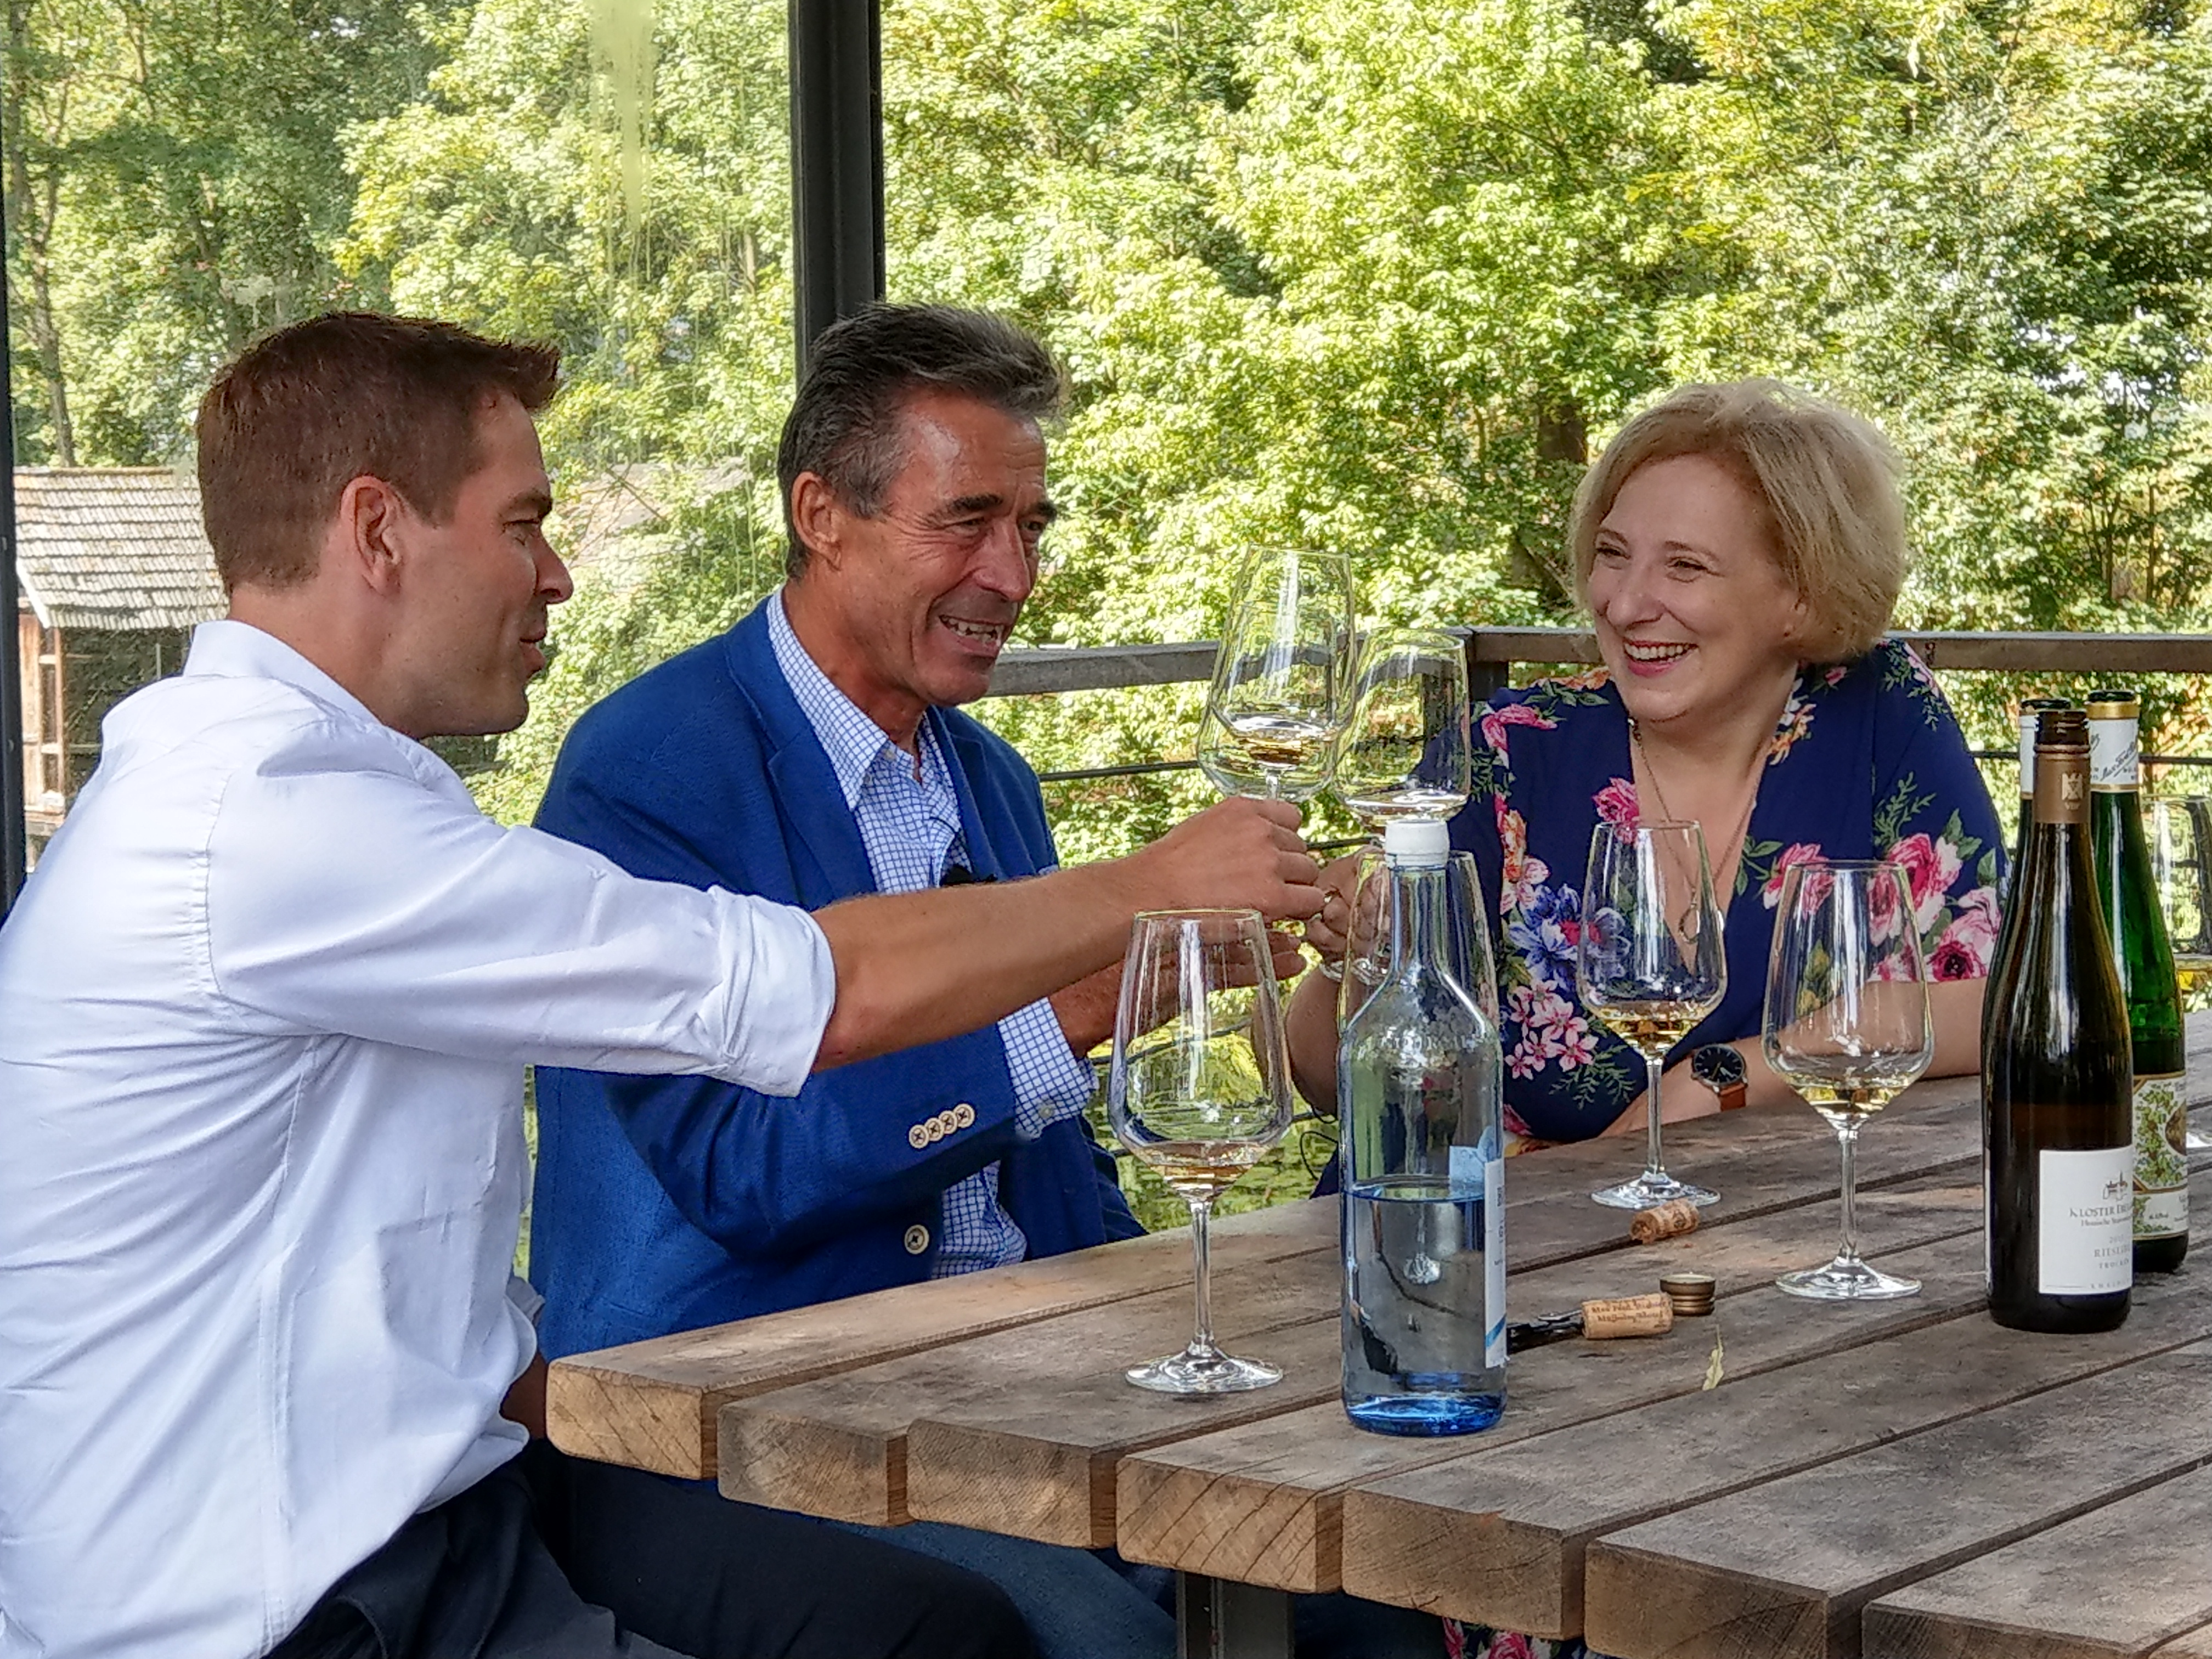 v.l.: Morten Brink Iwersen, Anders Fogh Rasmussen, Dr. Daniela De Ridder